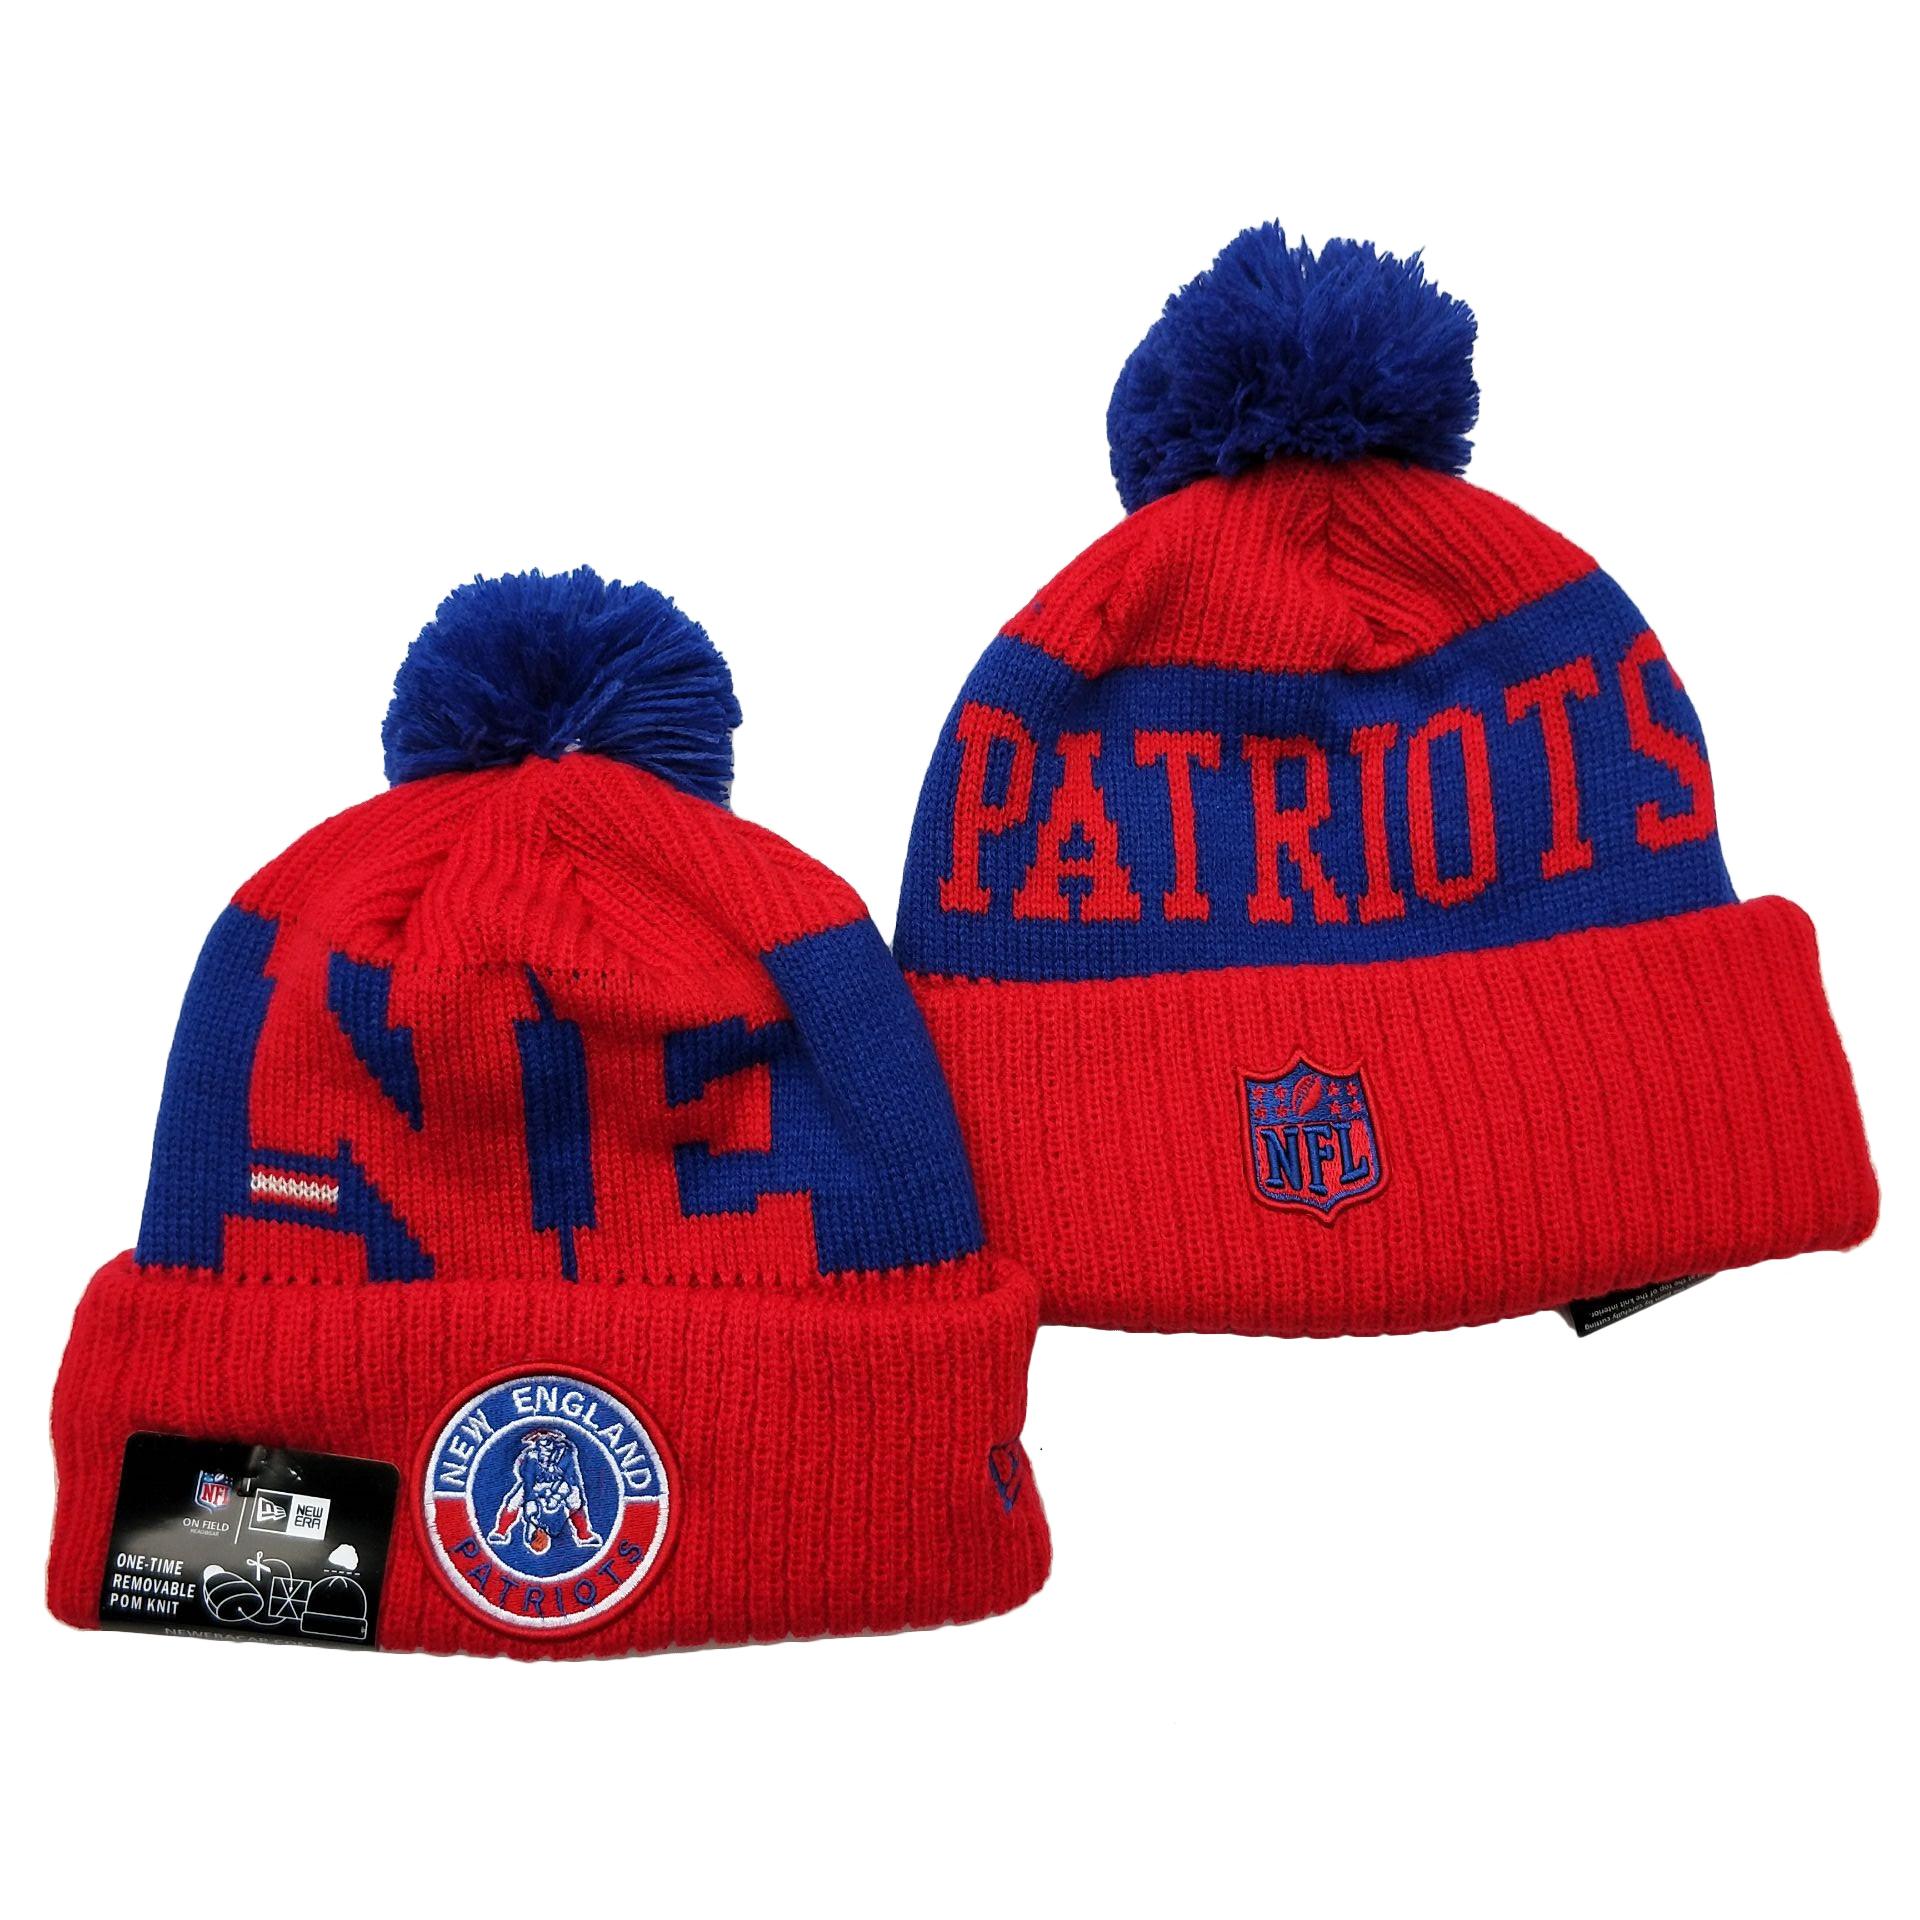 Patriots Team Logo Red 2020 NFL Sideline Pom Cuffed Knit Hat YD